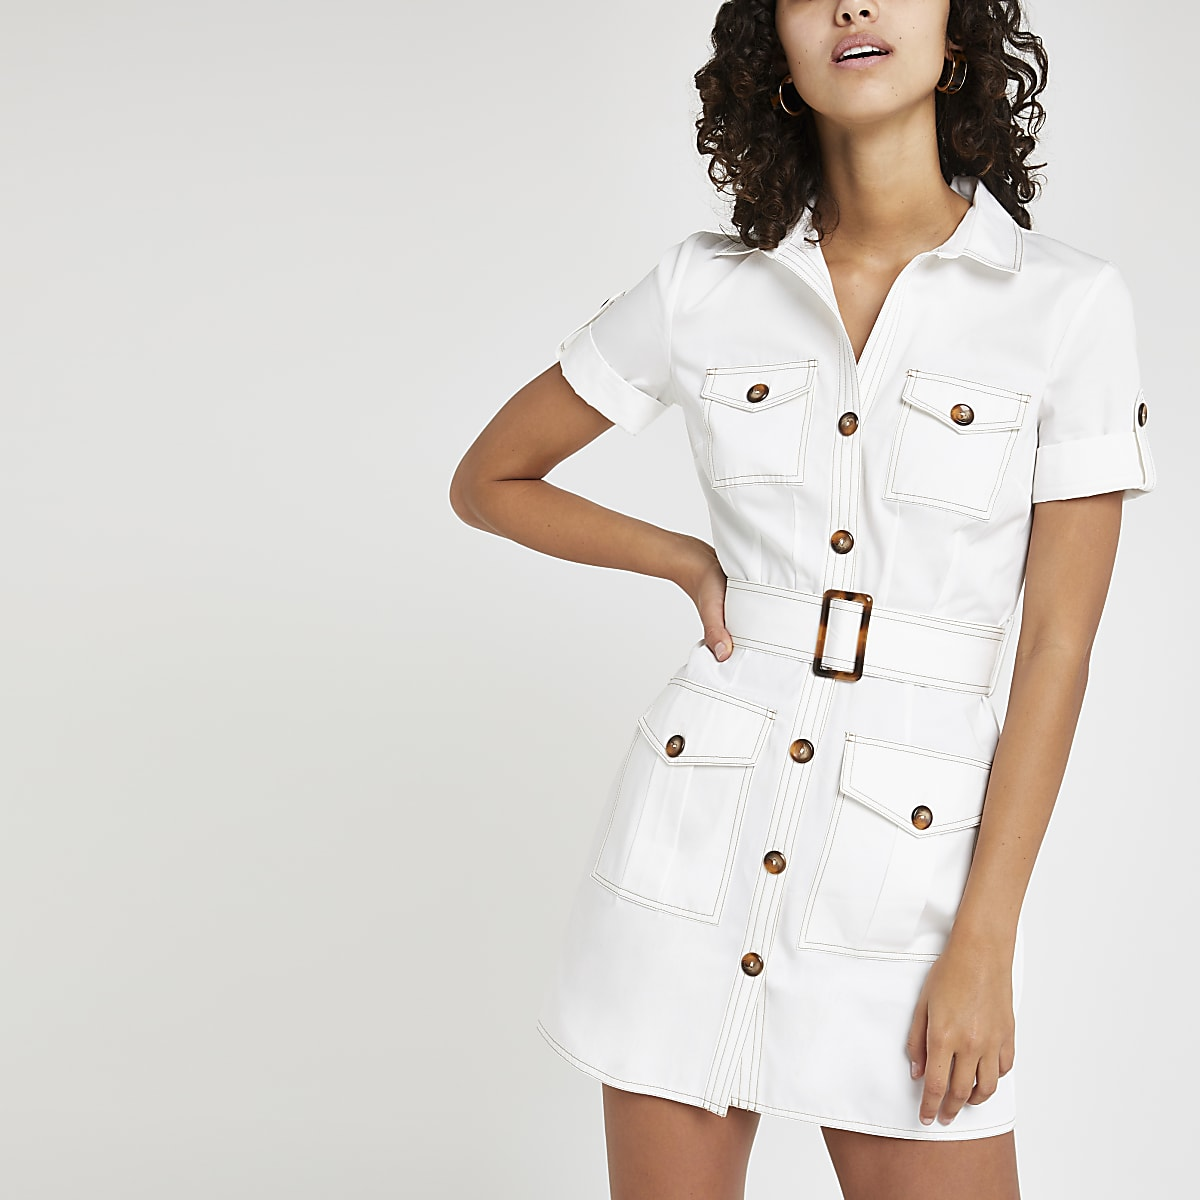 4c3b3f54dd Robe chemise fonctionnelle blanche à manches courtes - Robes ...